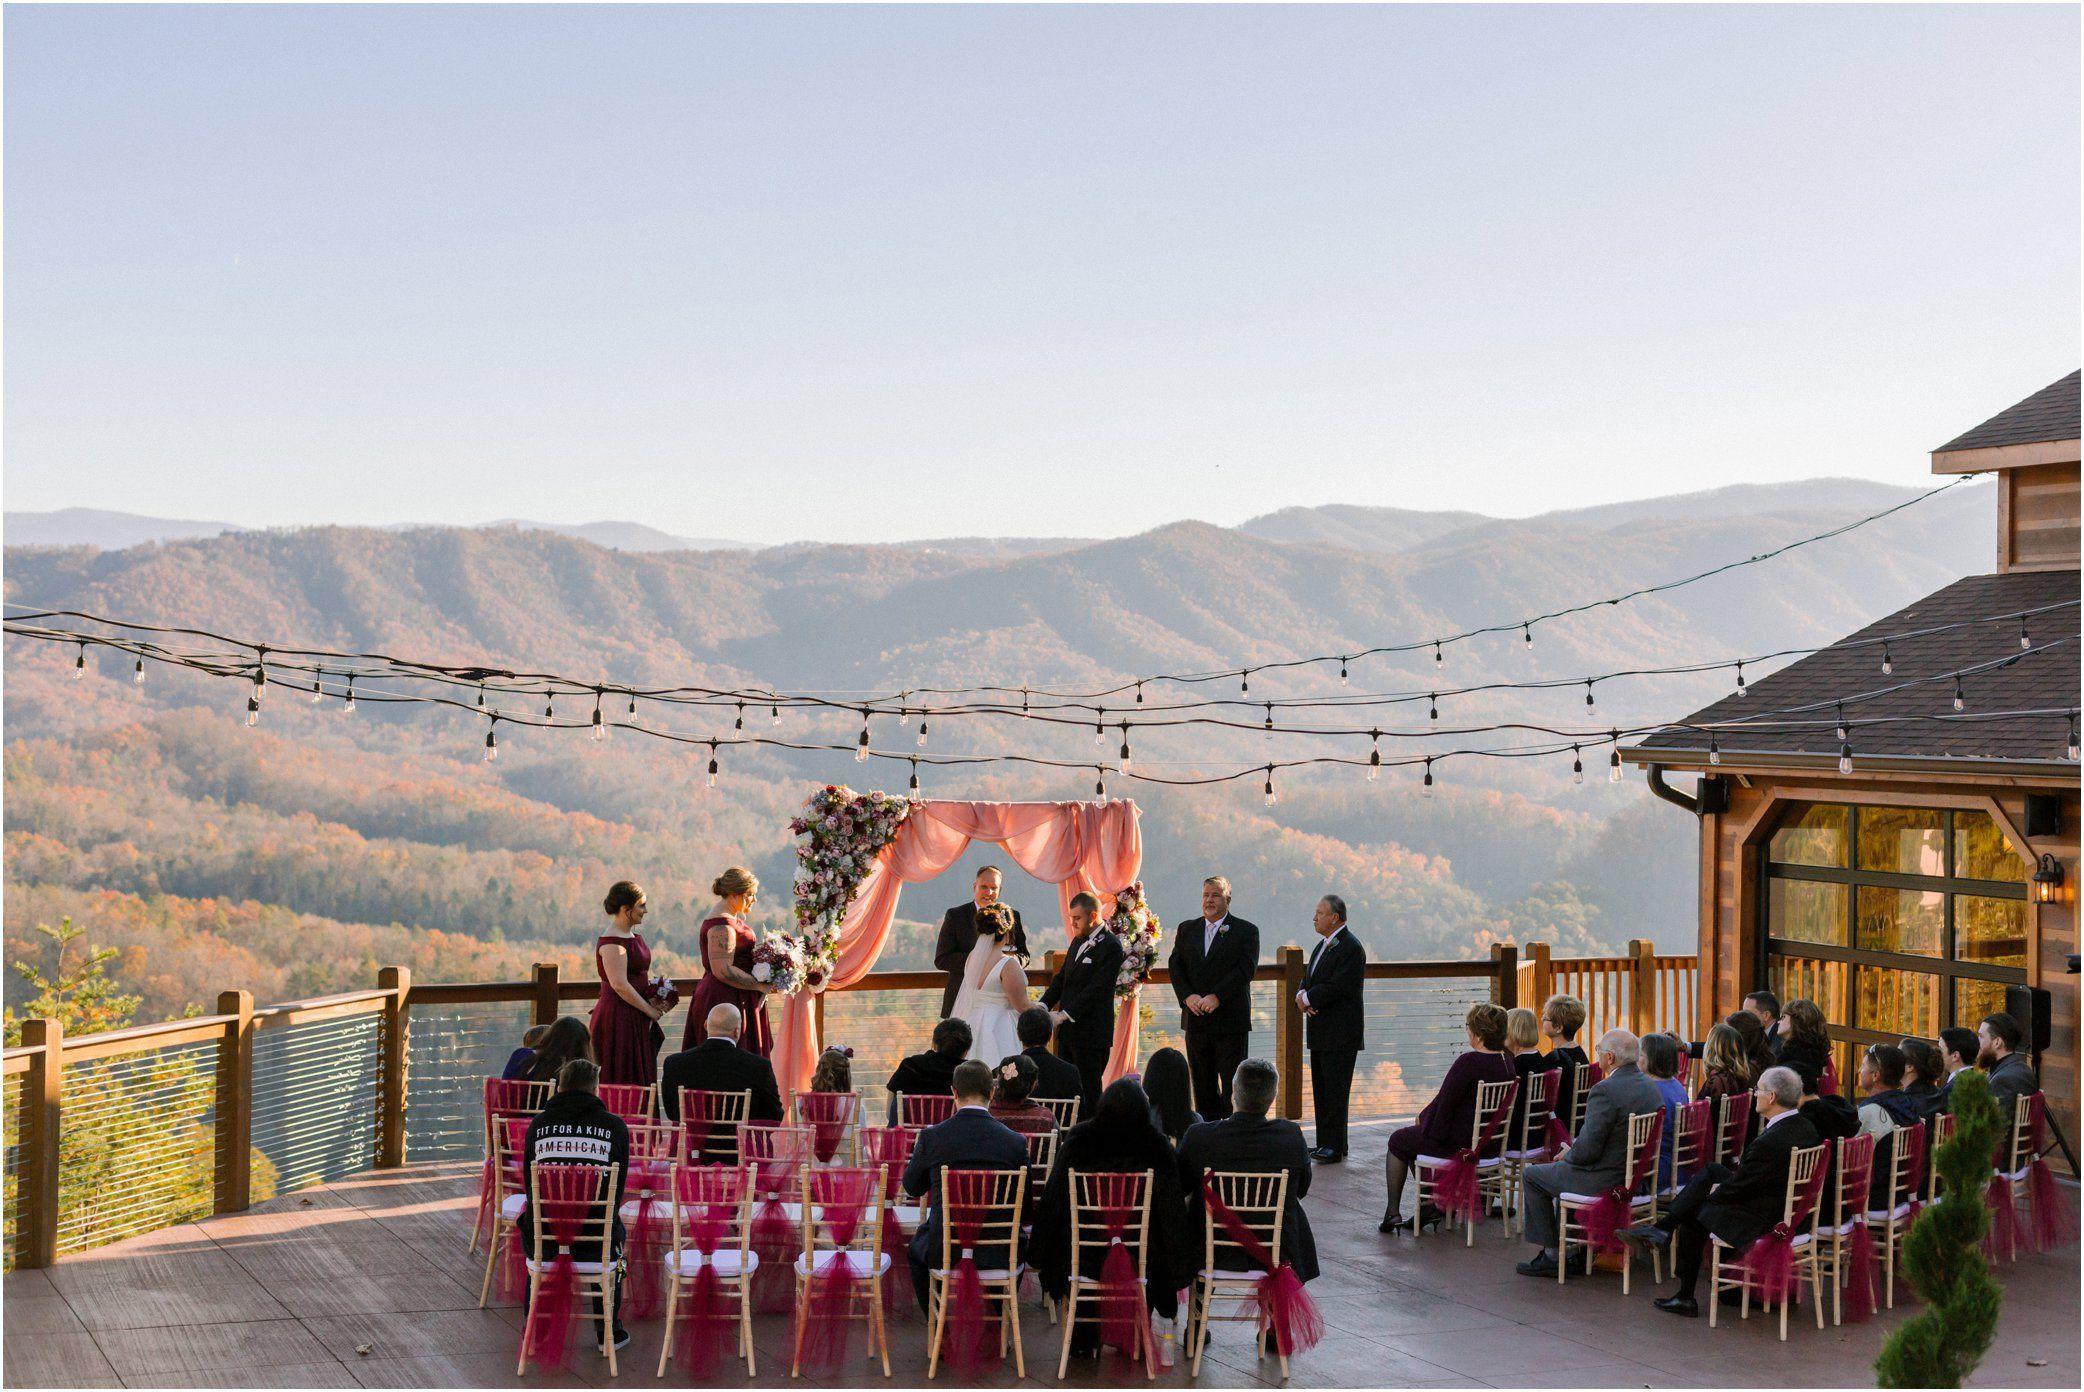 24+ The magnolia wedding venue smoky mountains info